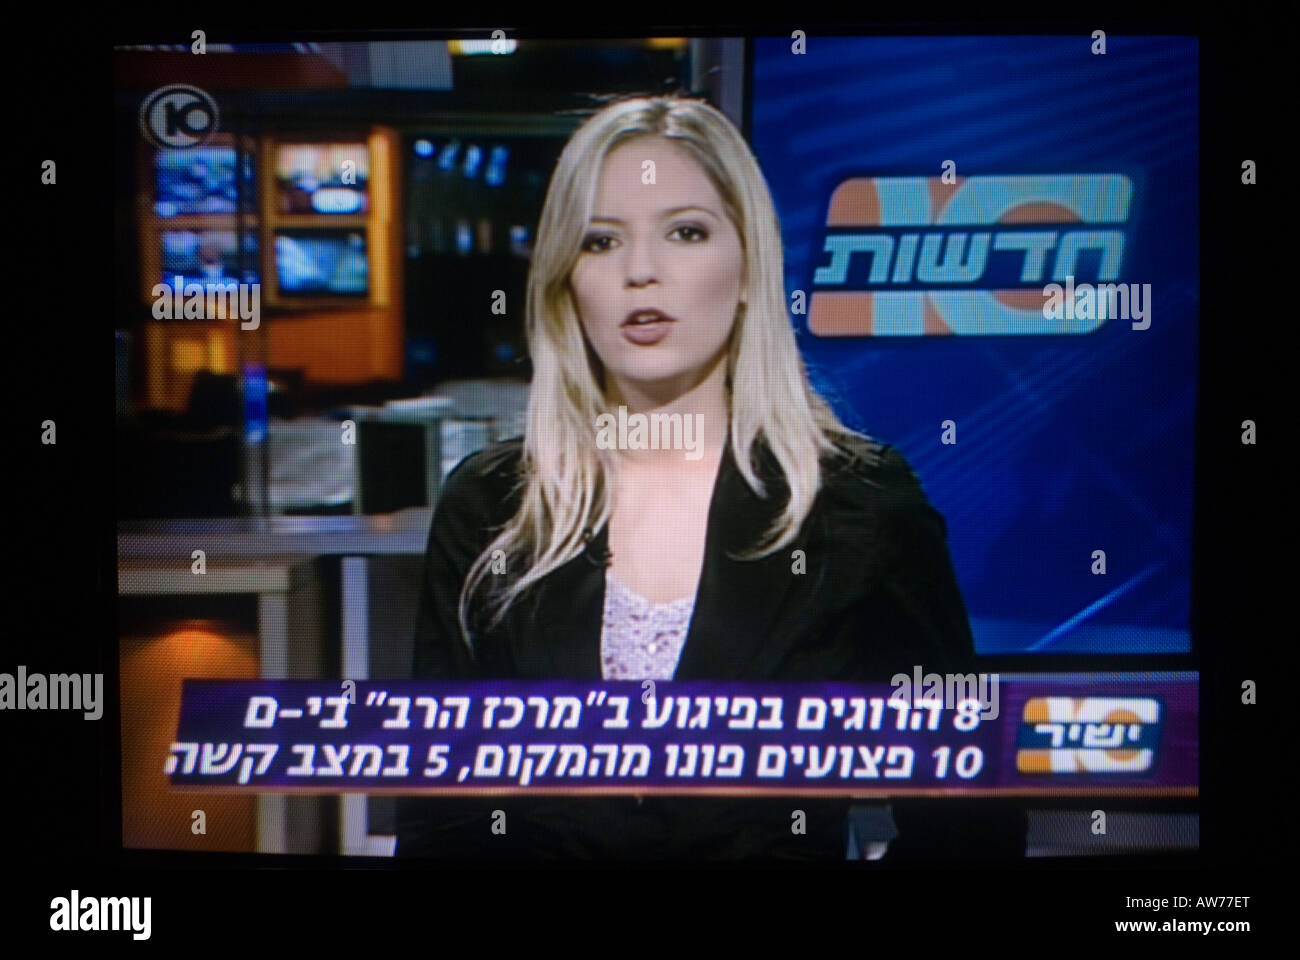 Screen shot of news anchor Tali Moreno broadcasting live a